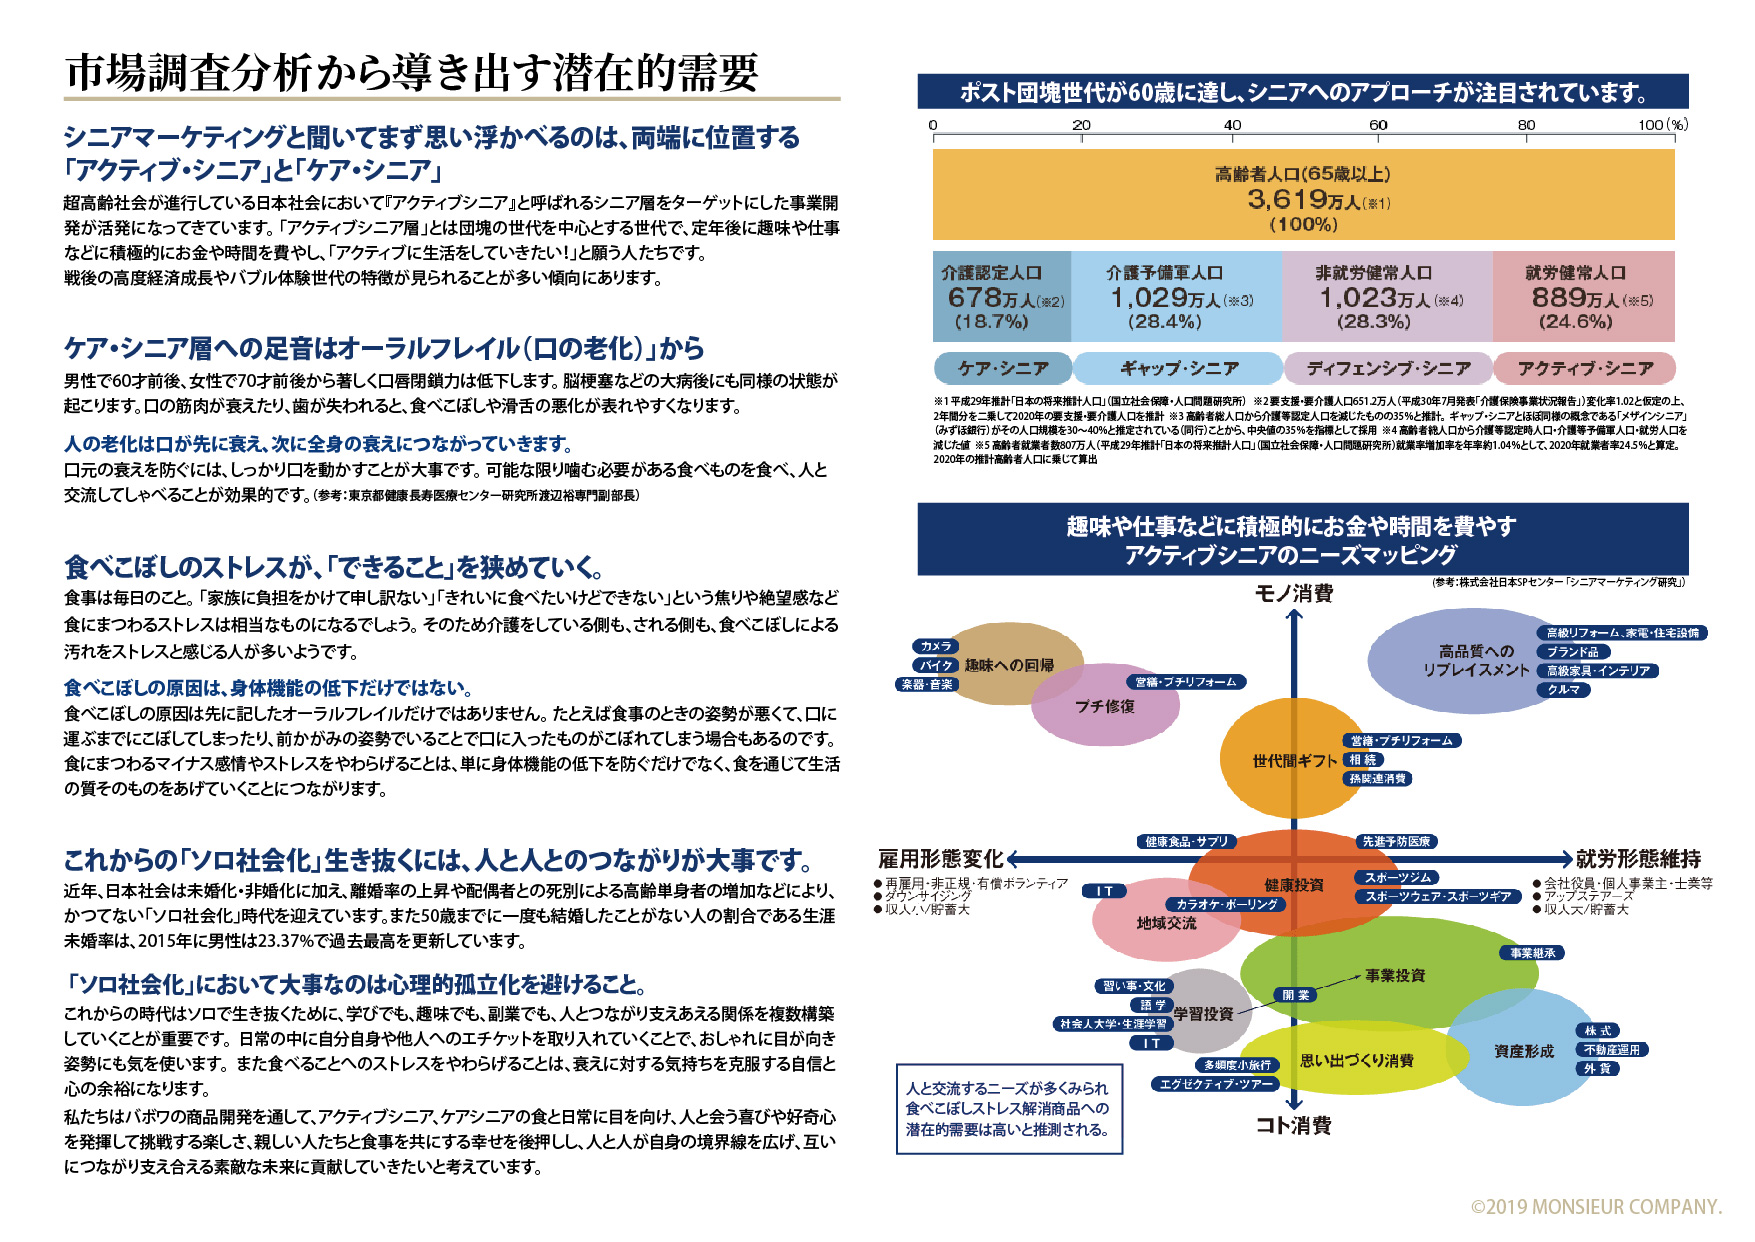 MC小島巌商店用バボワ企画書_販売戦略